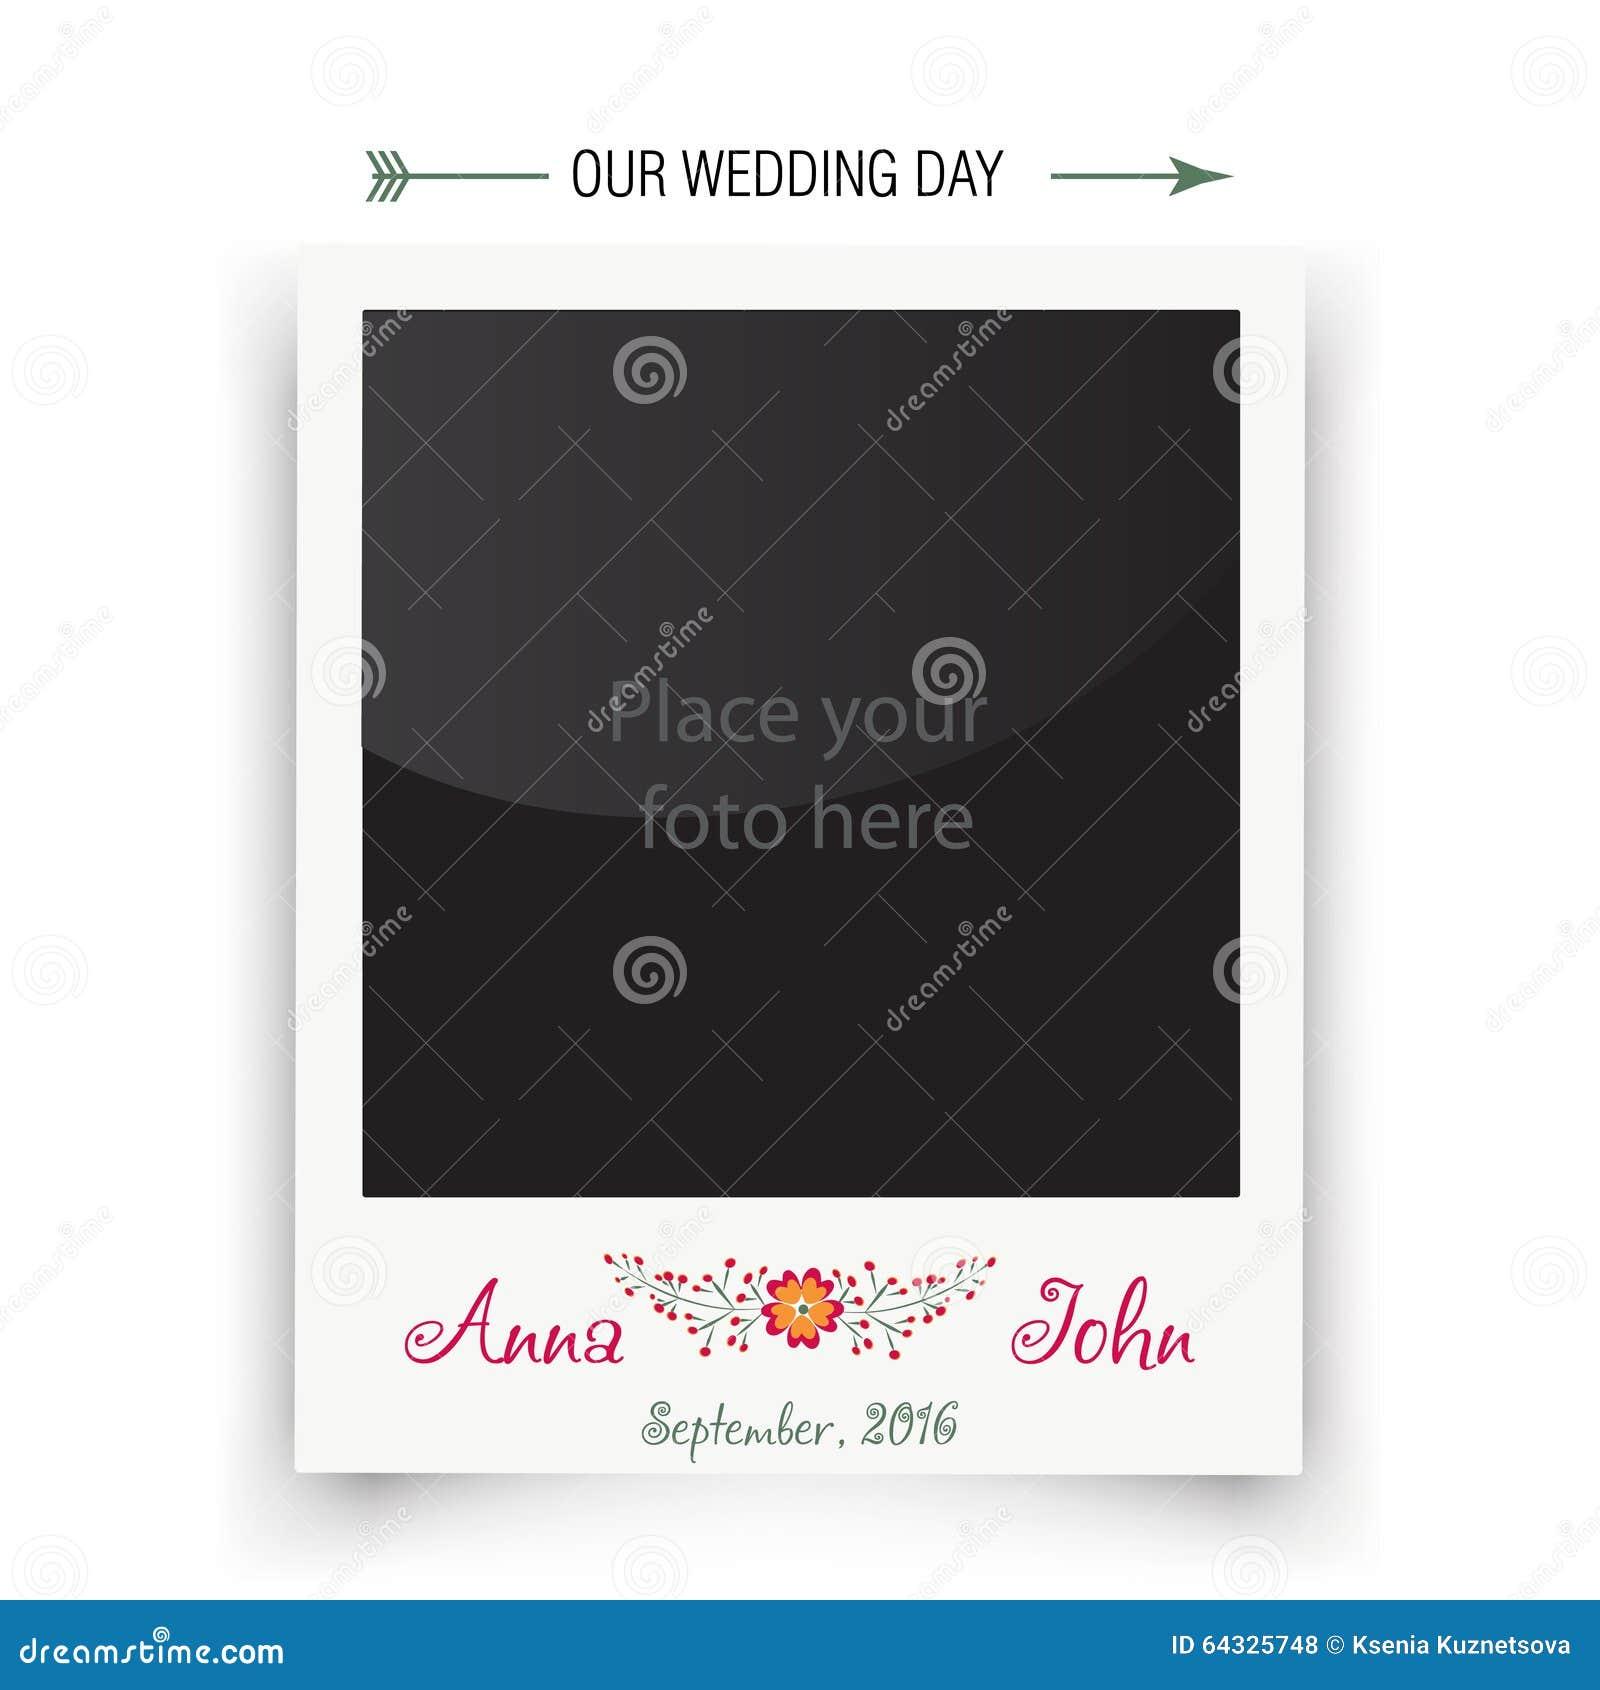 Polaroid Photo Template Royalty Free Photography Image – Polaroid Template